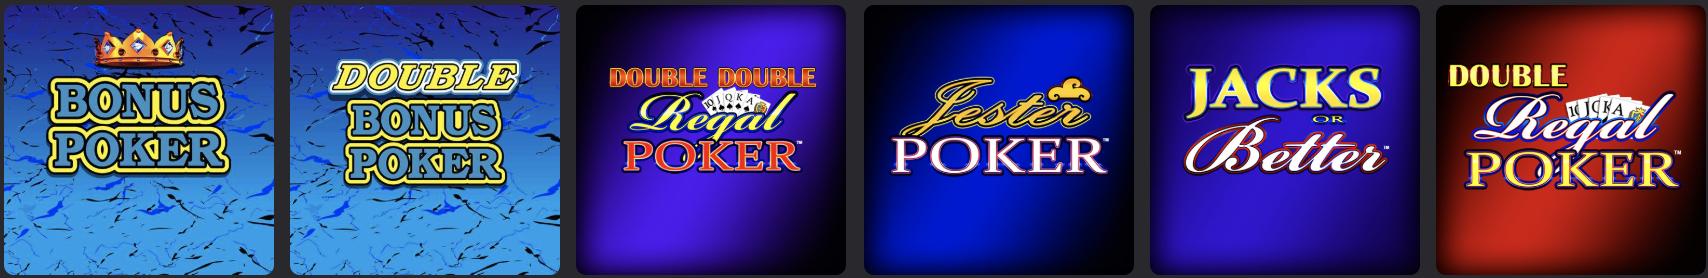 playmgm casino online nj video poker